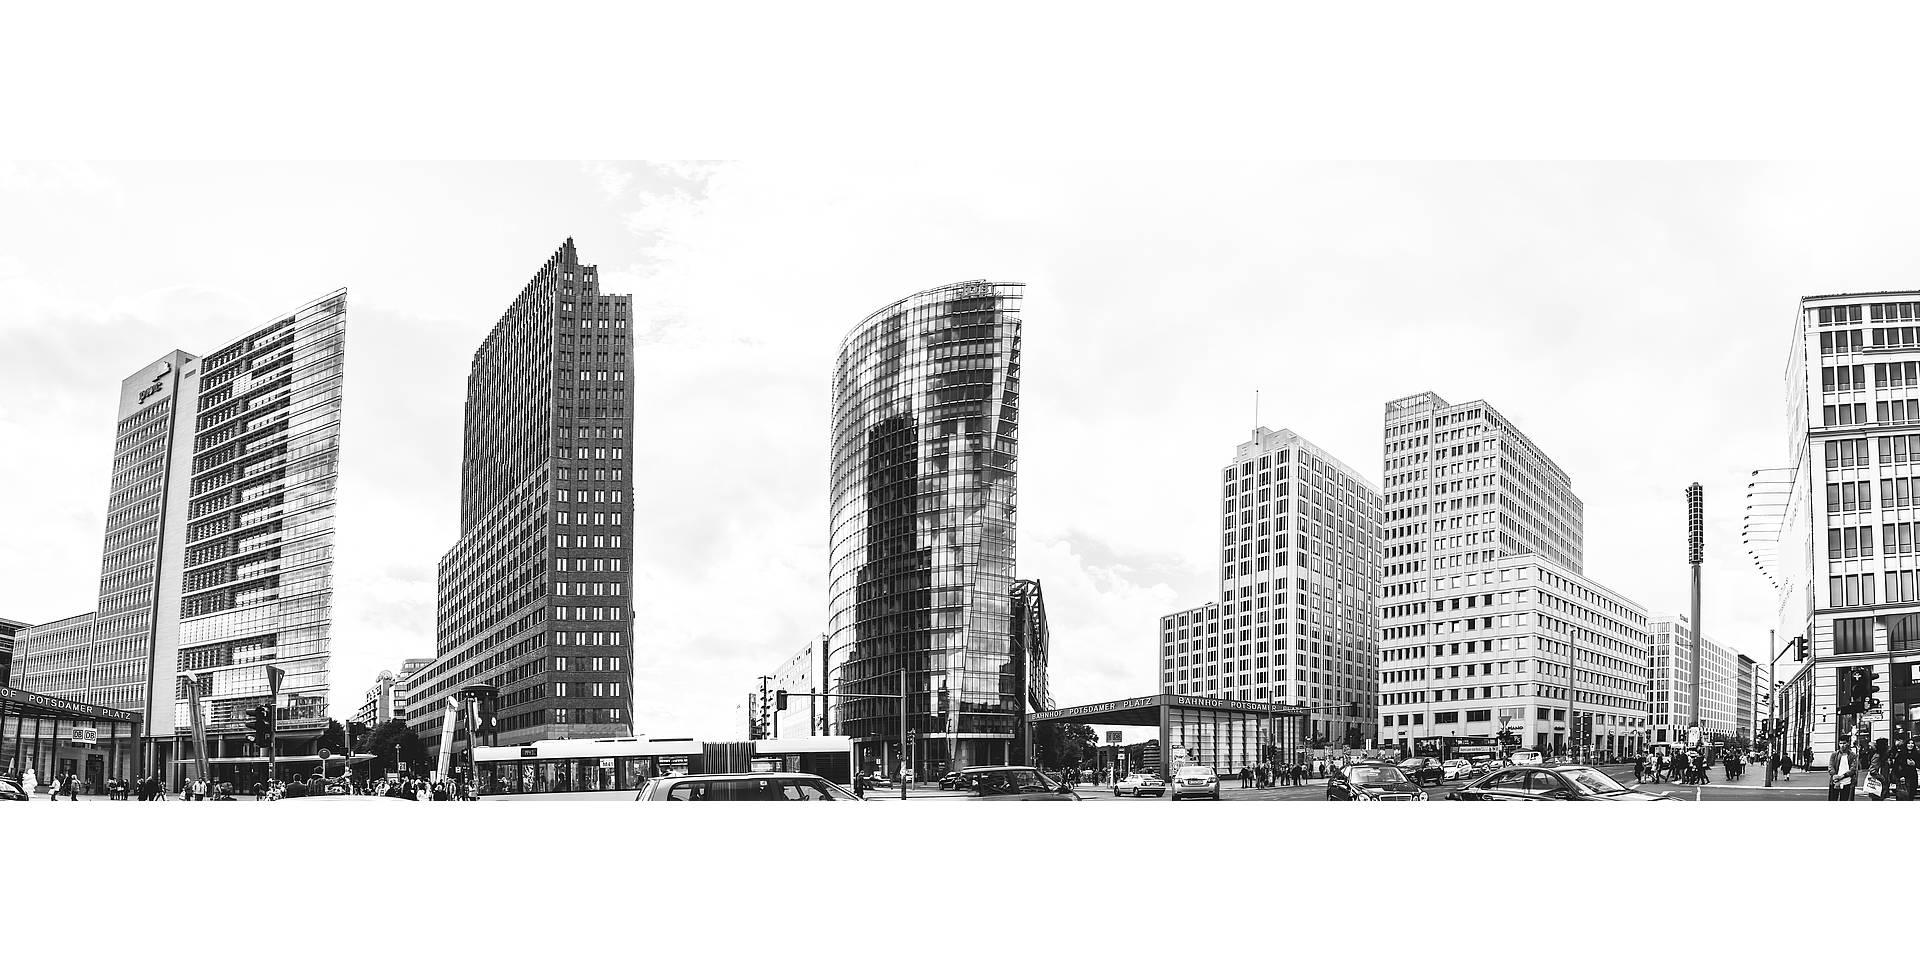 Live your Life - Descubre Berlín - Potsdamerplatz